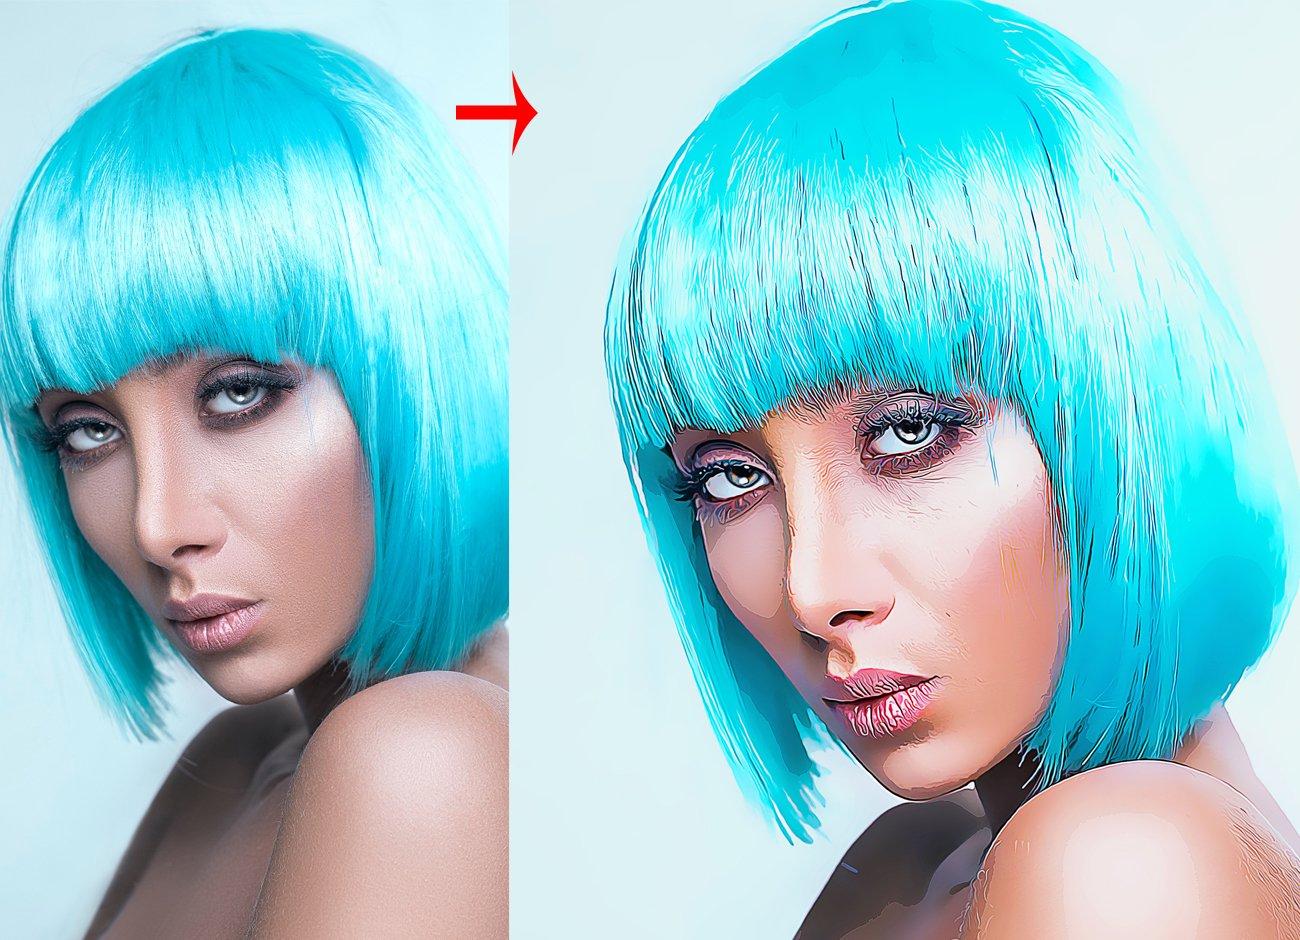 油画绘画效果照片处理特效PS动作模板 Vector Art Effect Photoshop Action插图3